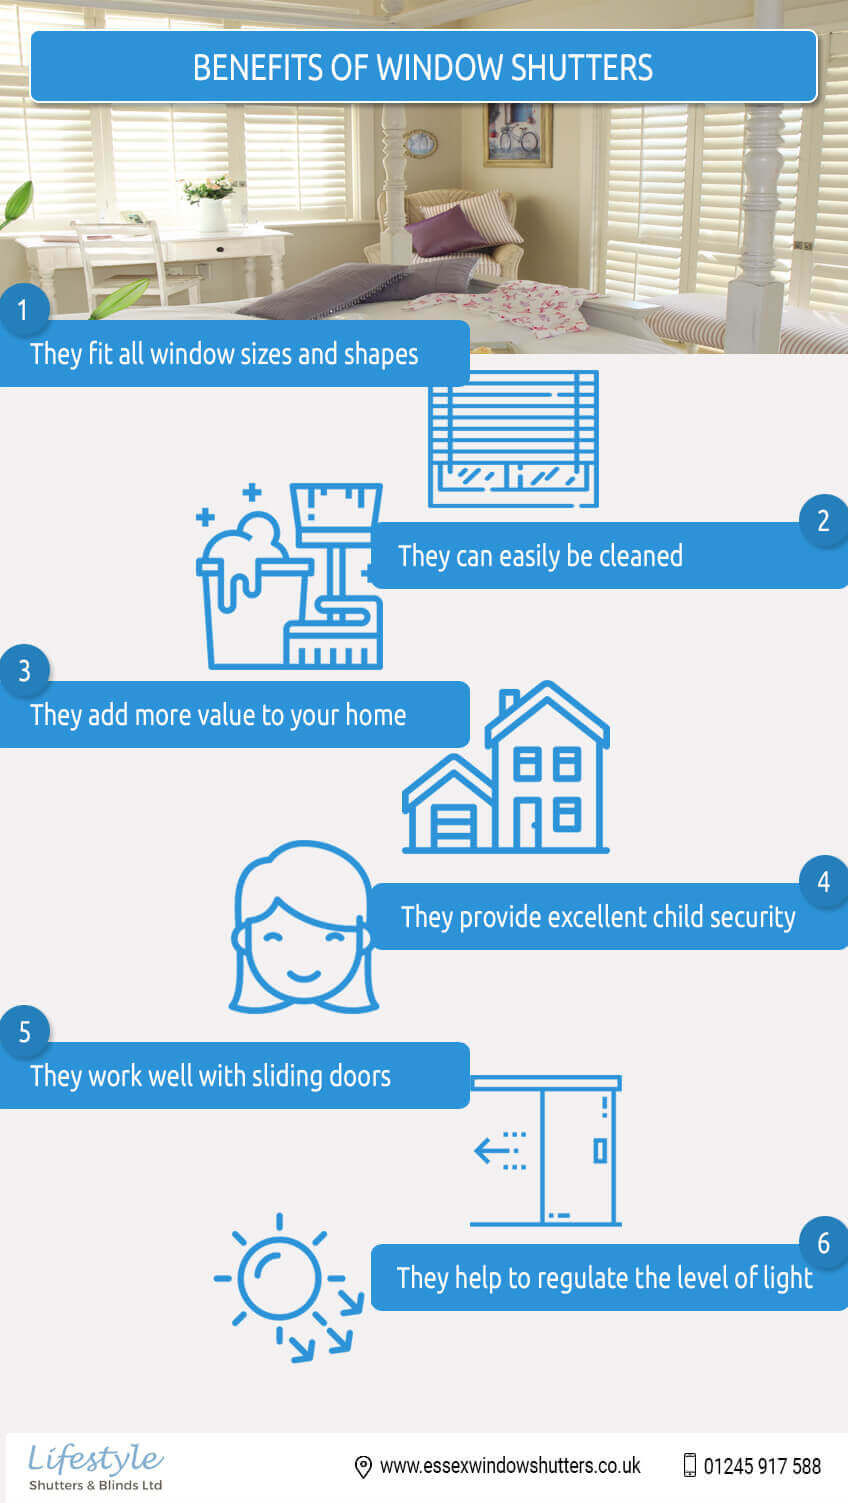 Benefits-of-Window-Shutters